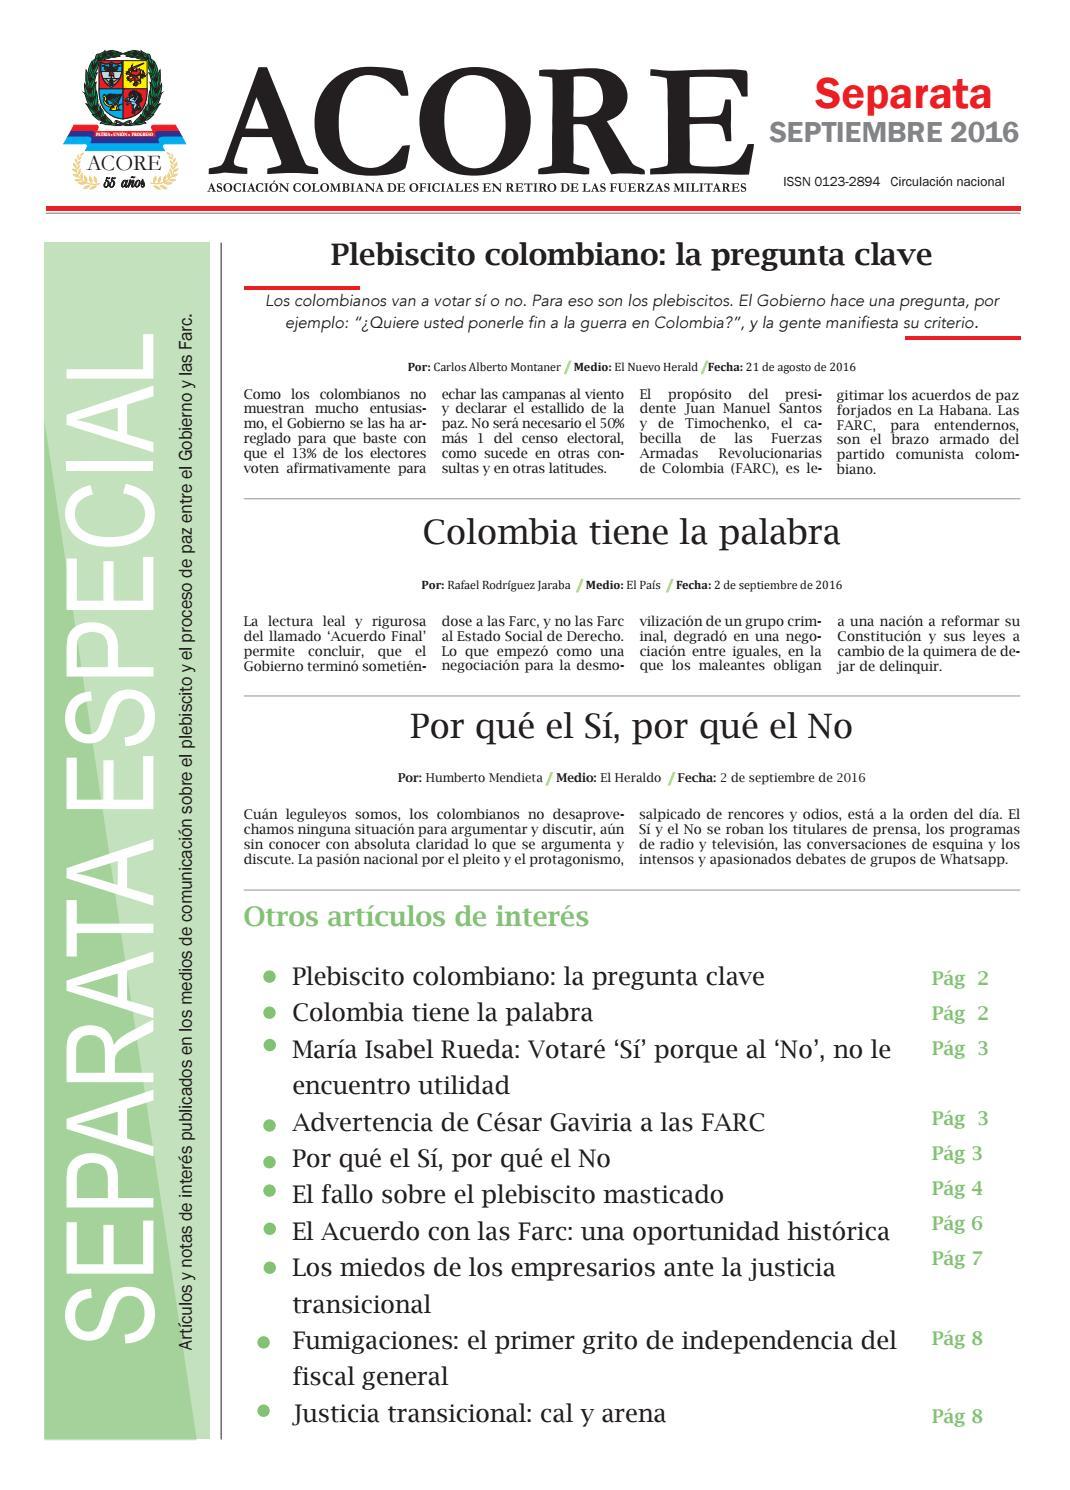 Separata medios septiembre 2016 by ACORE - issuu